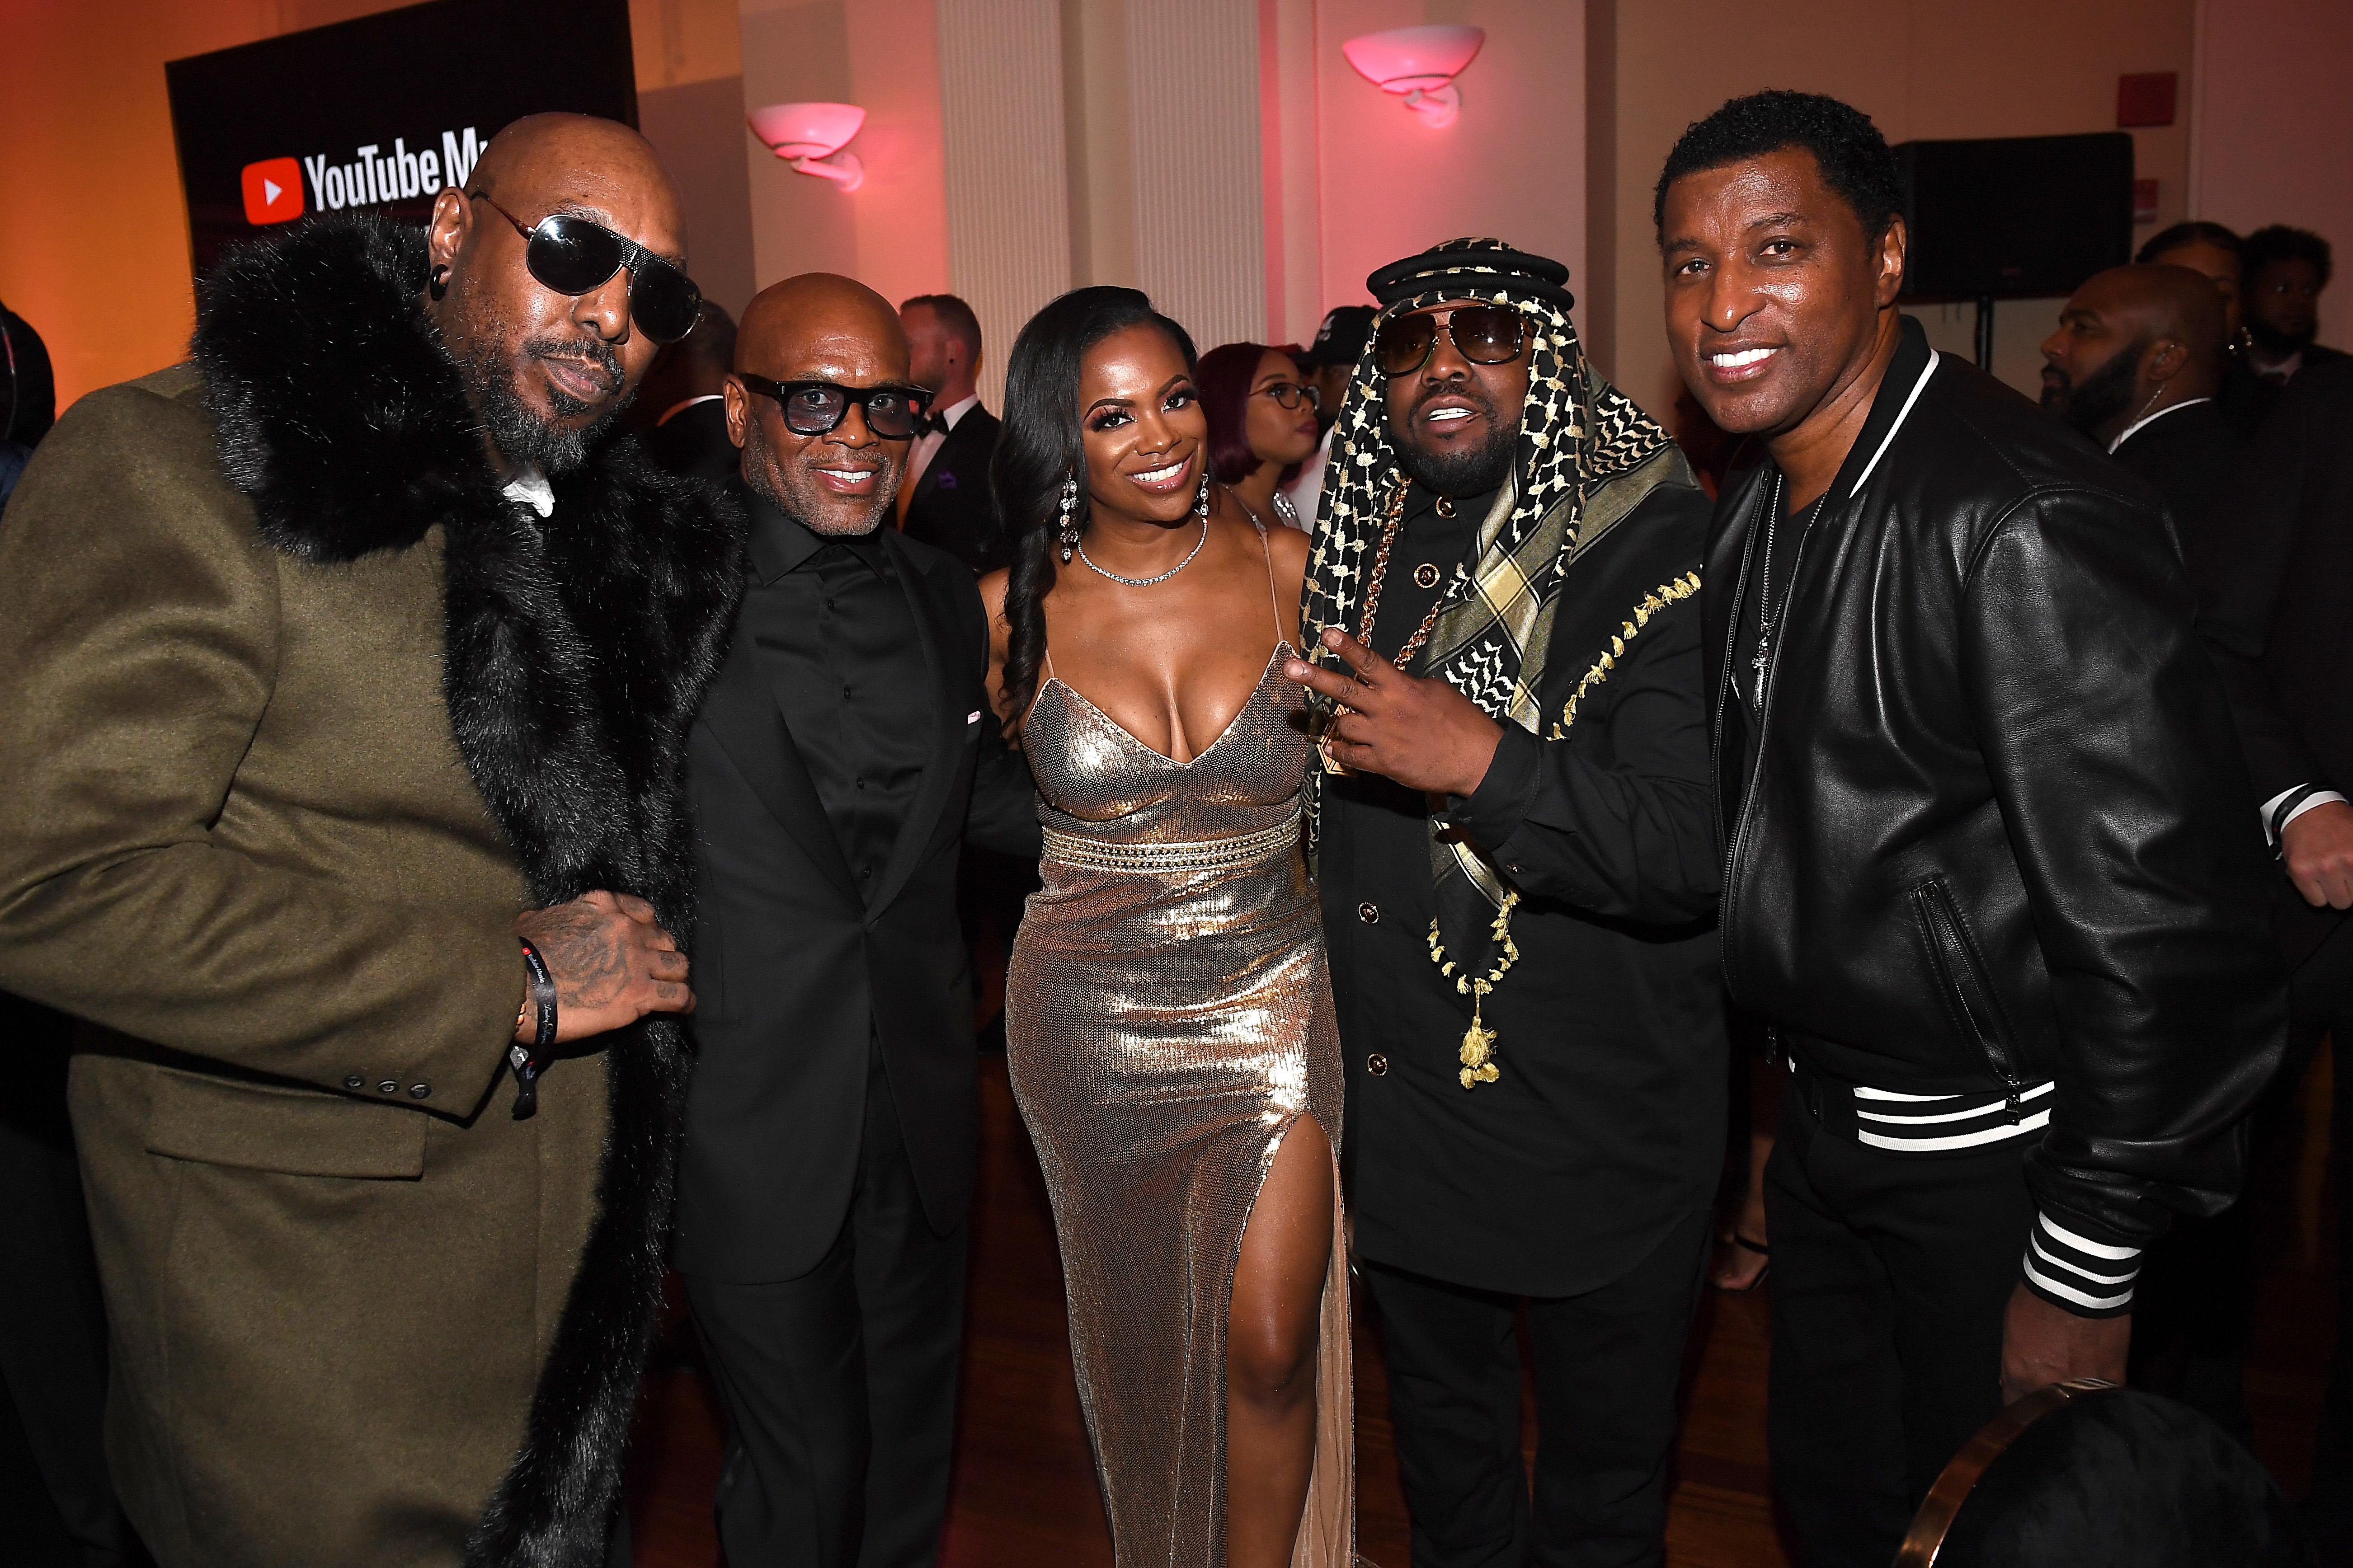 Sleepy Brown, L.A. Reid, Kandi Burruss, Big Boi and Babyface attend YouTube Music 2020 Leaders & Legends Ball